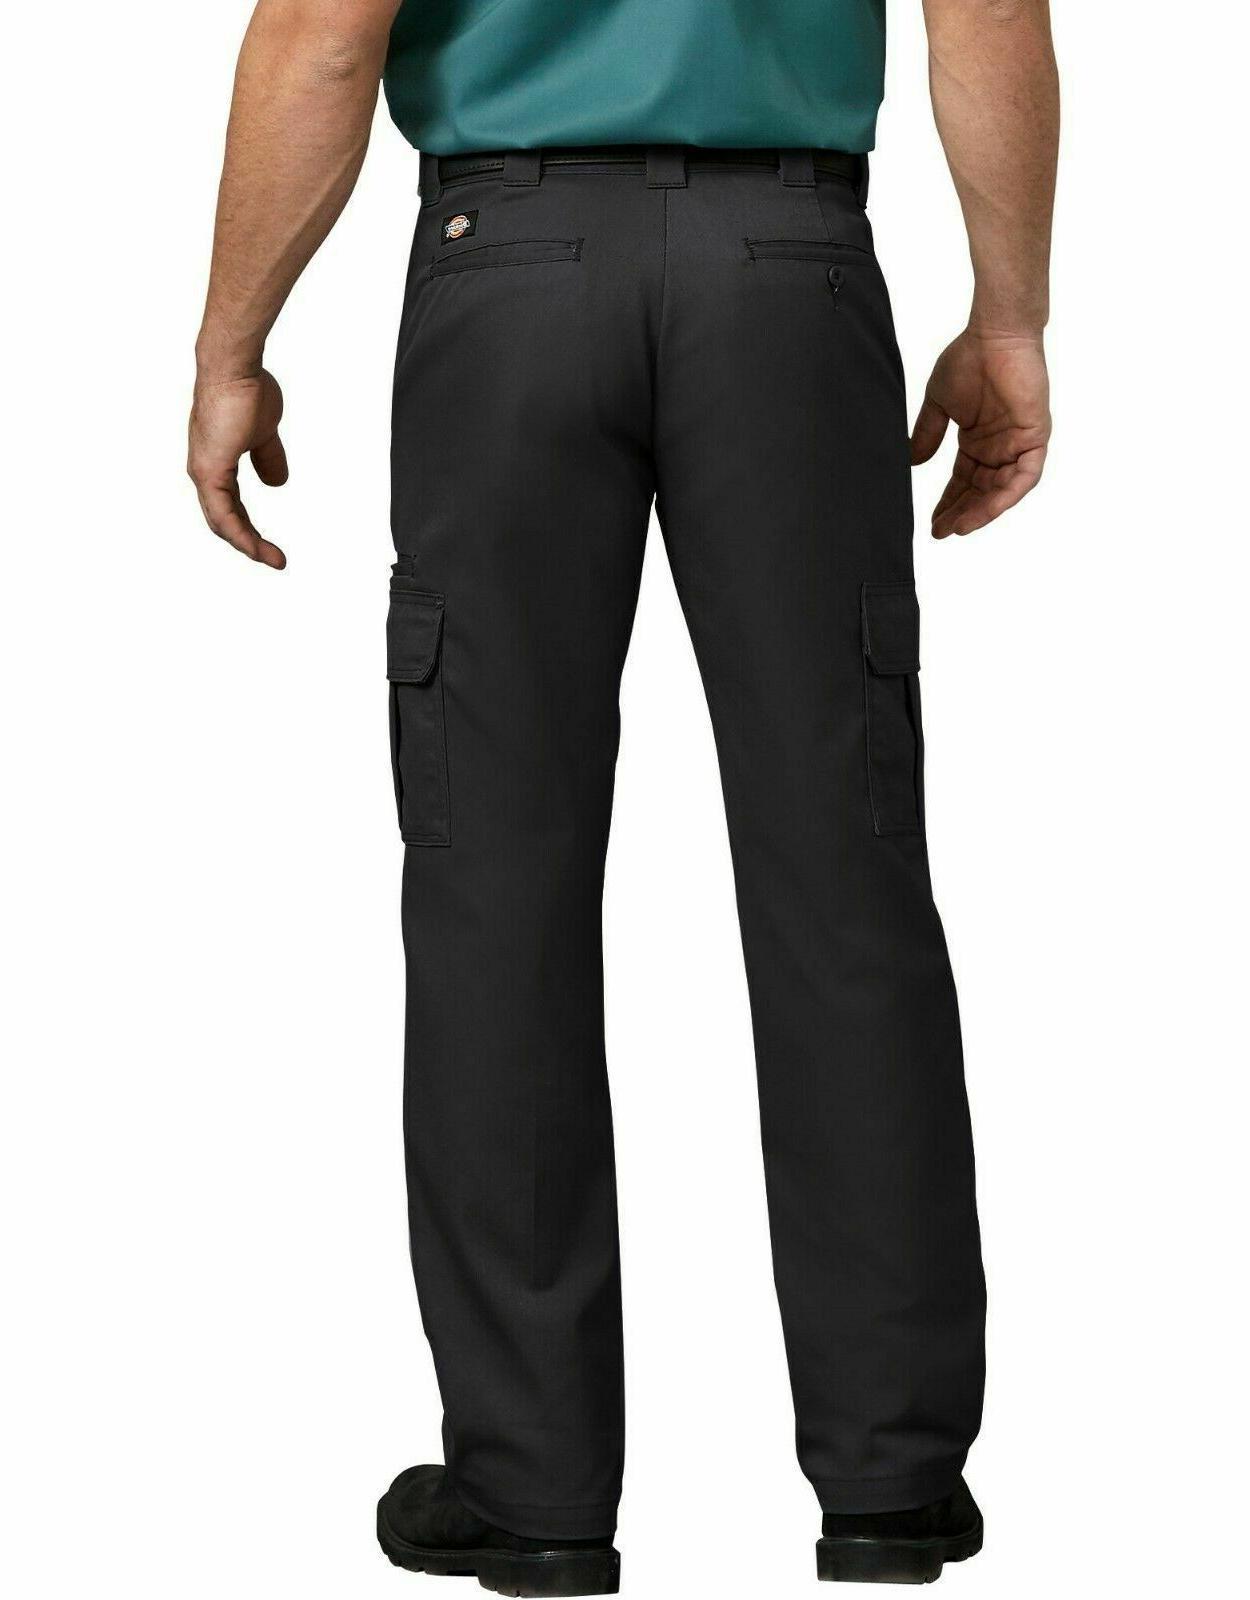 Dickies Flex Regular Fit Straight Work Pants